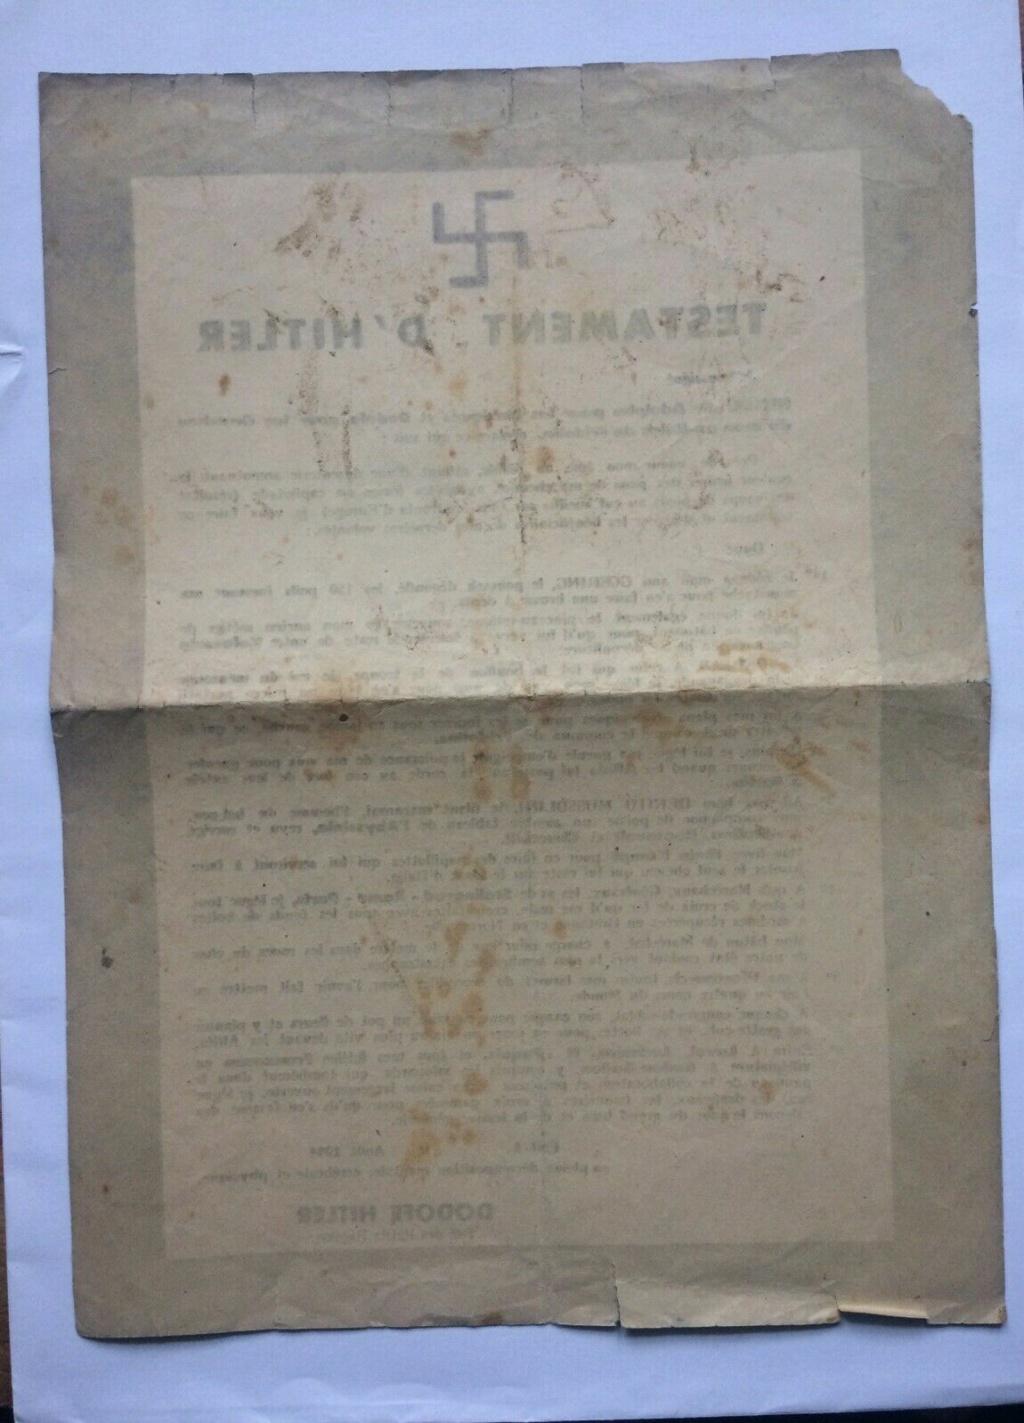 Tract de résistant (testament hitler) S-l16142